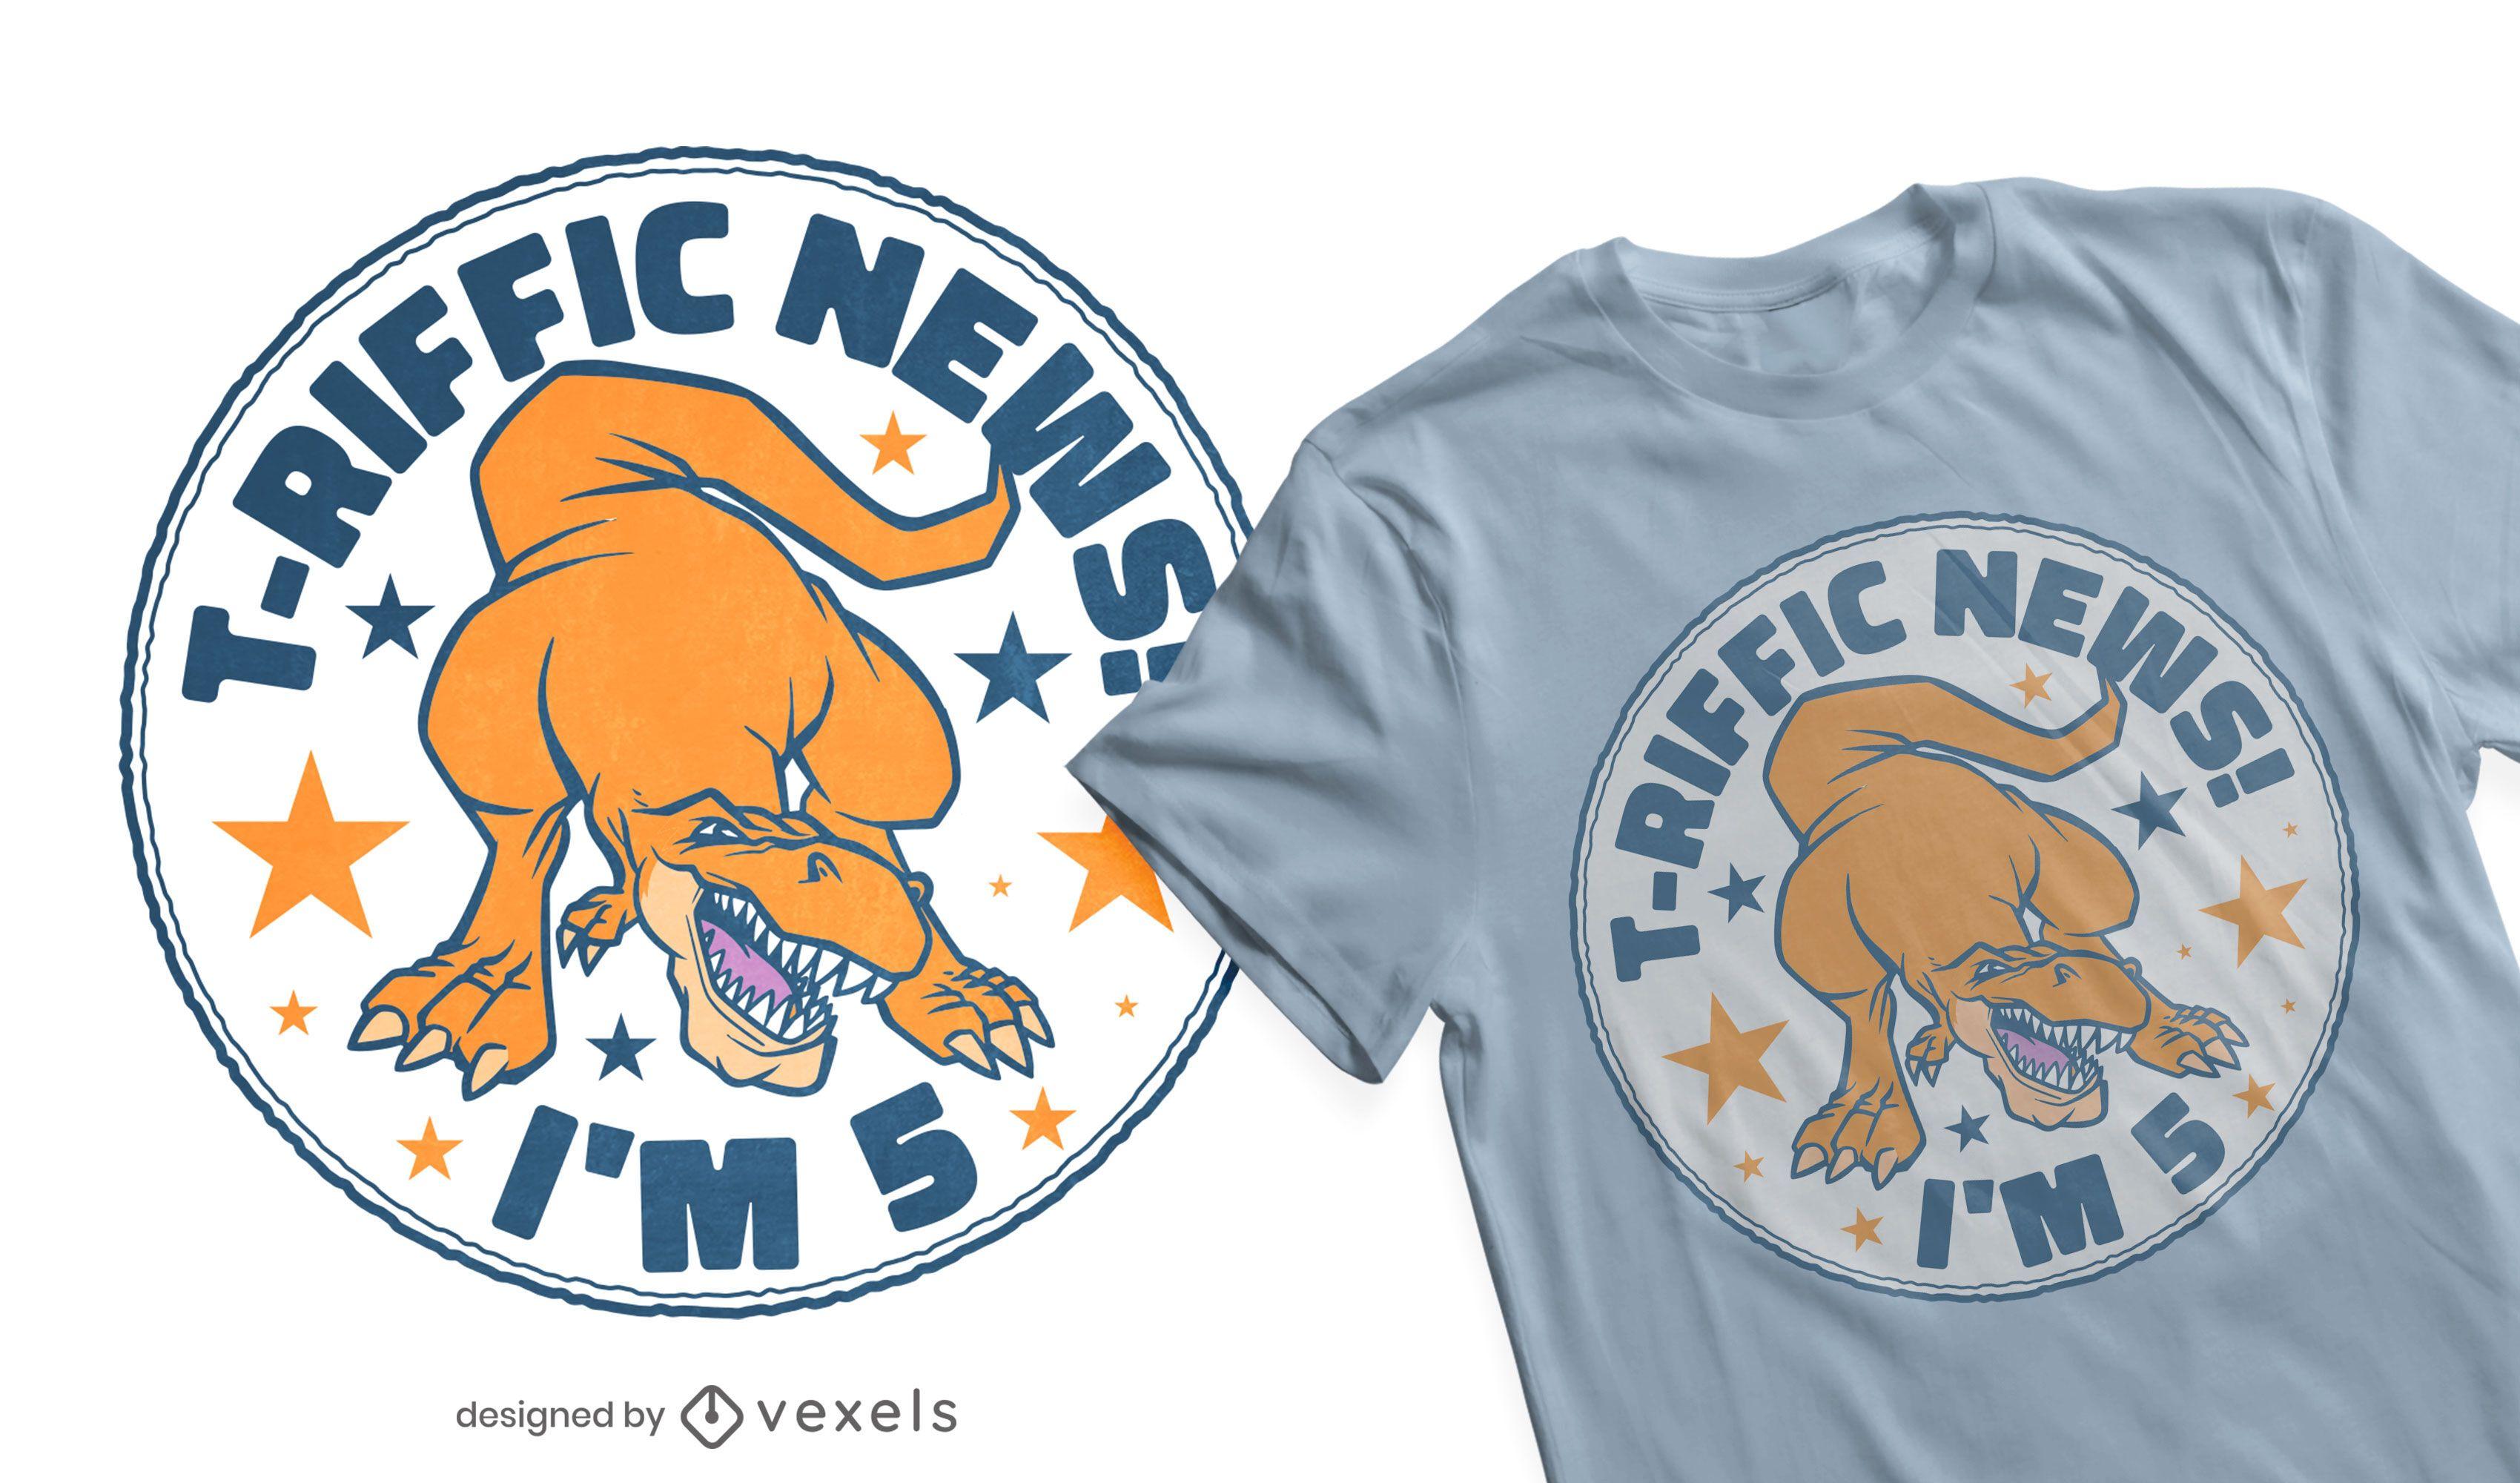 T-Riffic Geburtstag T-Shirt Design